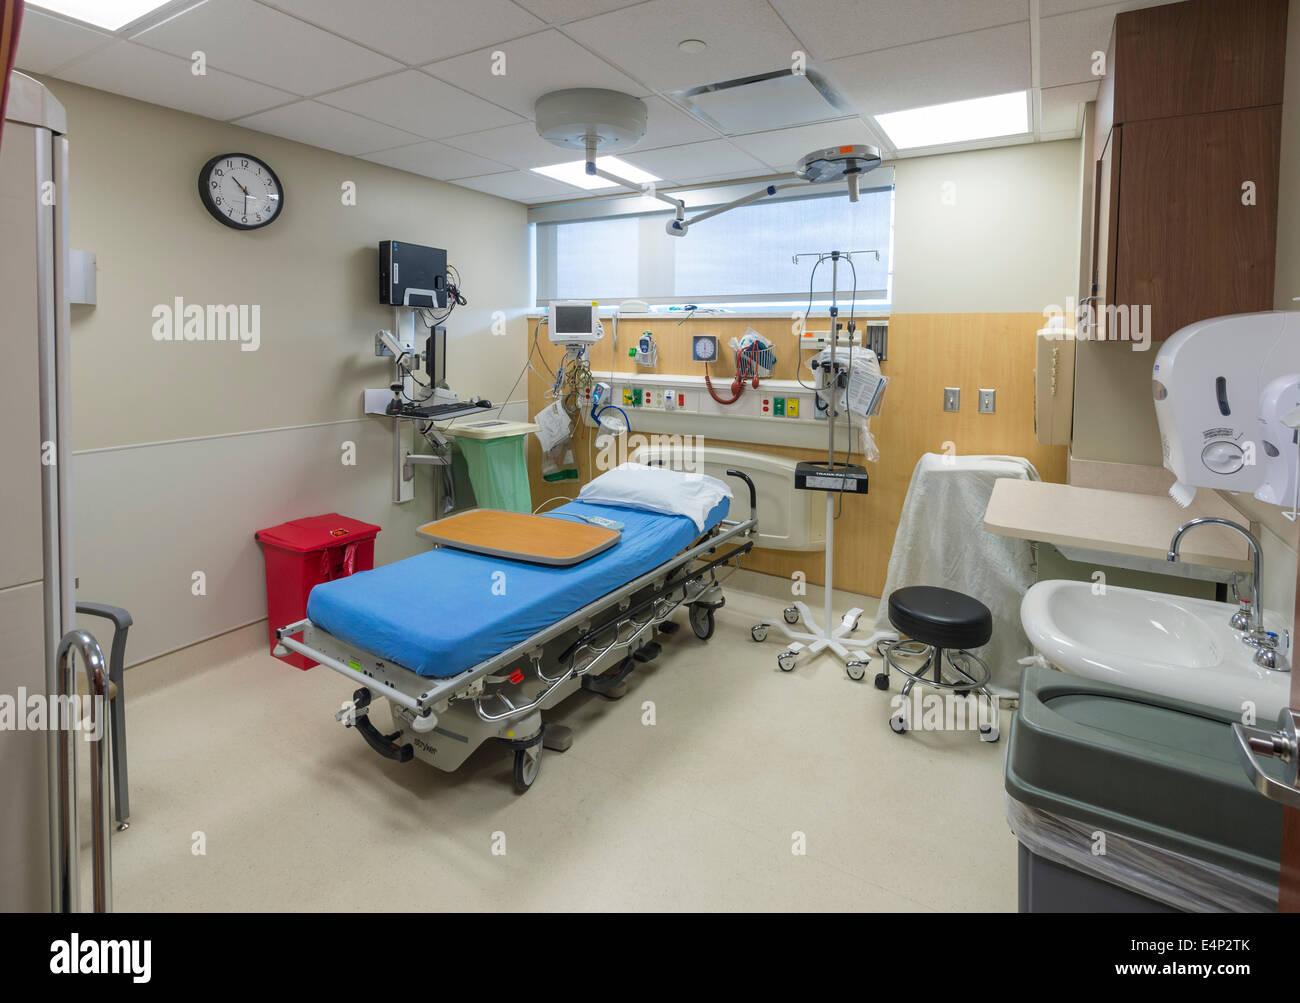 Empty Hospital Emergency Room - Stock Image